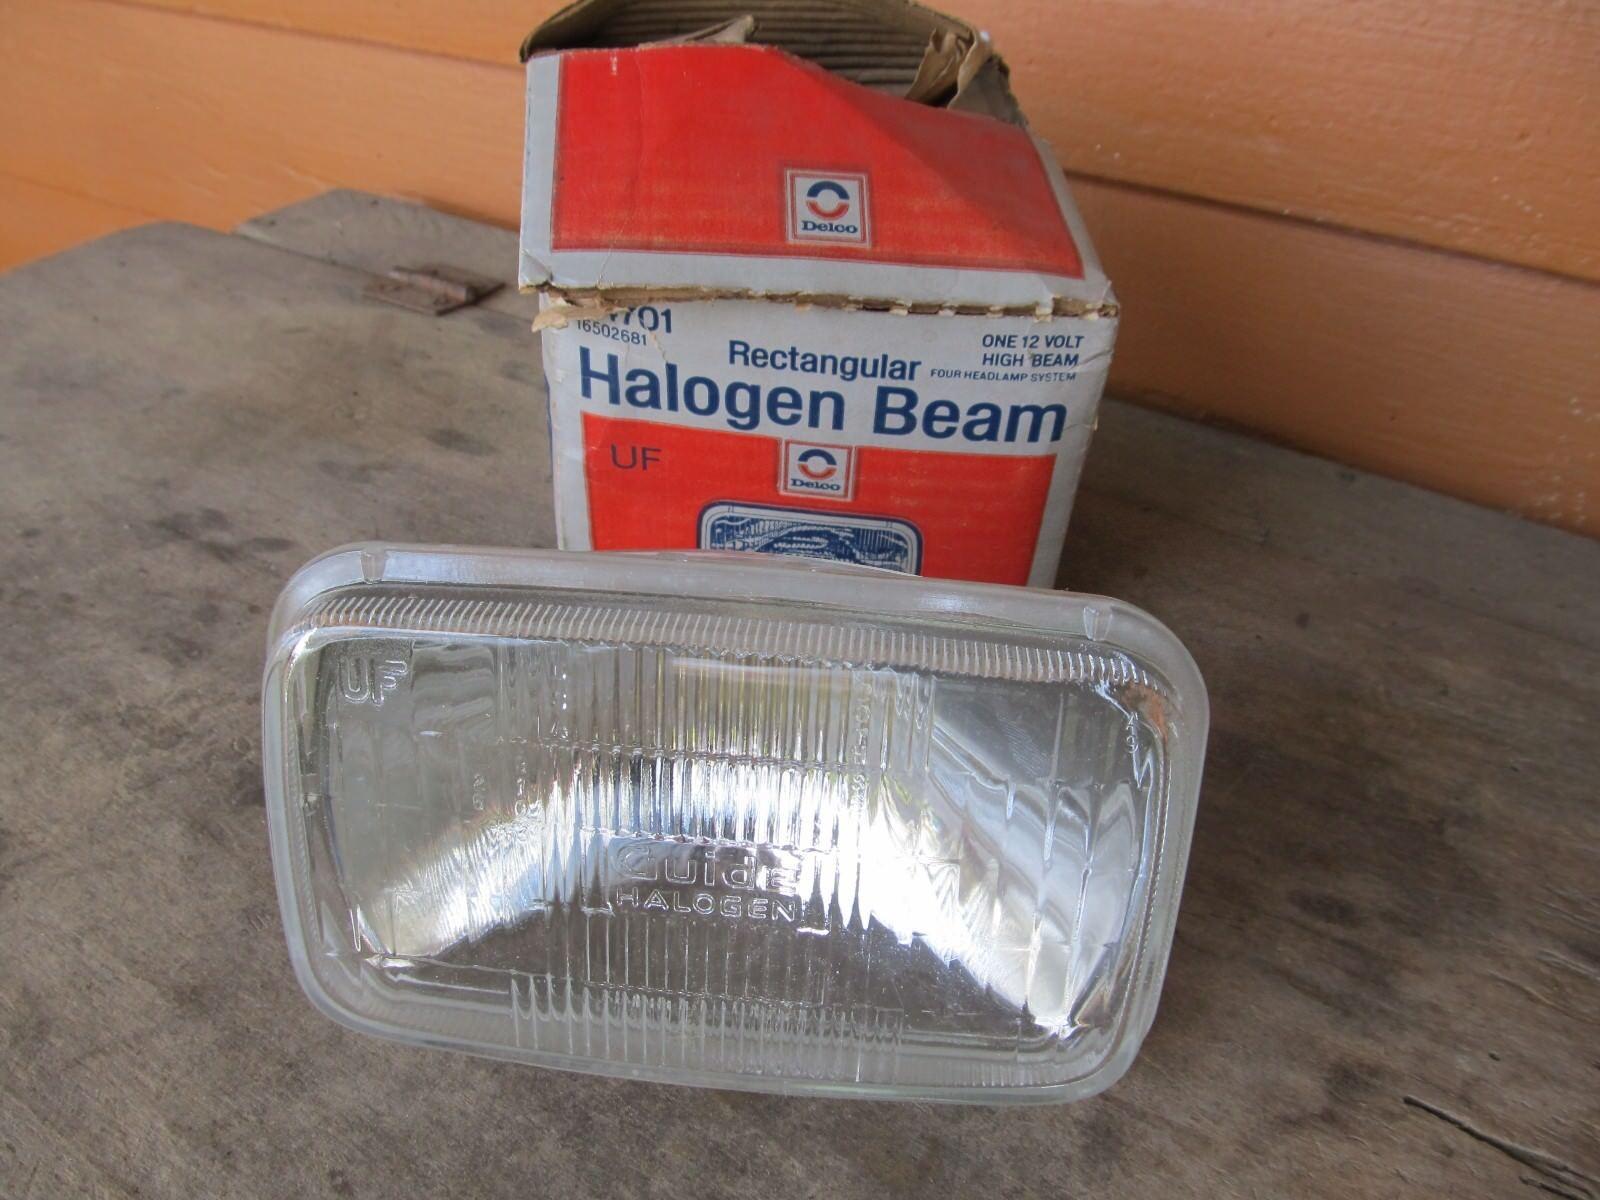 NOS AC Delco H4701 Rectangular Halogen Headlight GM# 16502681